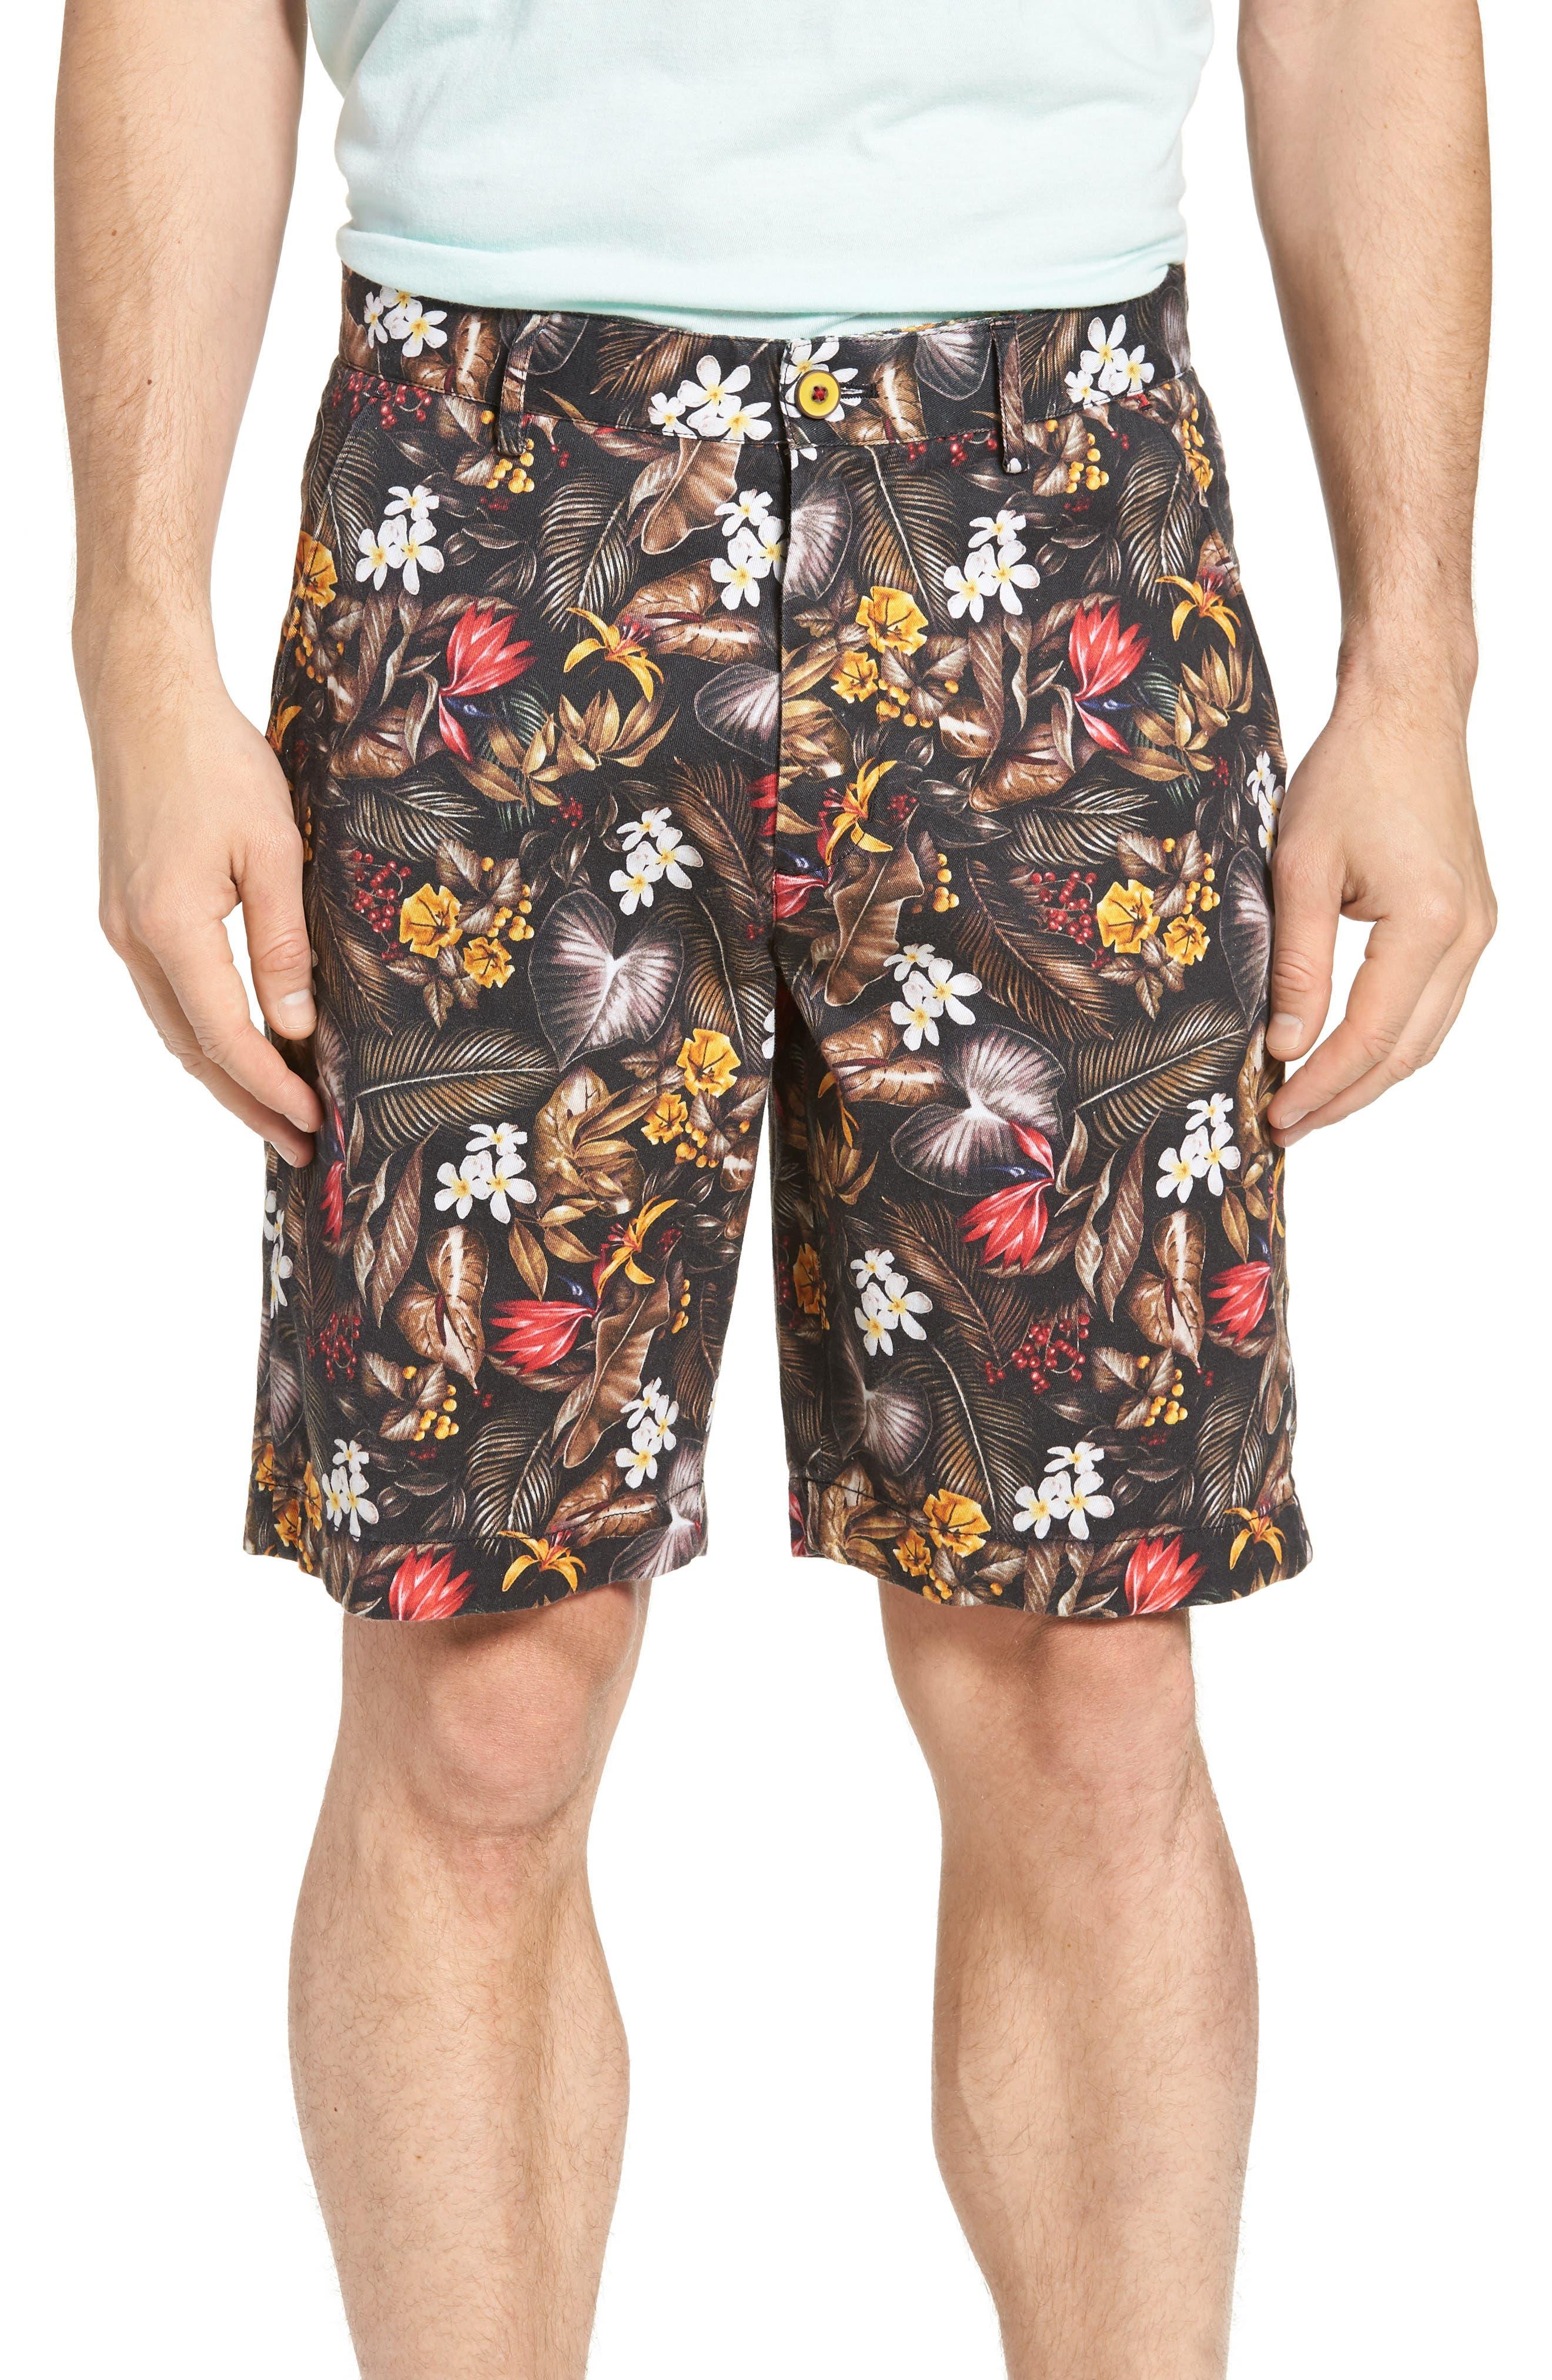 Maracas Woven Shorts,                         Main,                         color, Multi